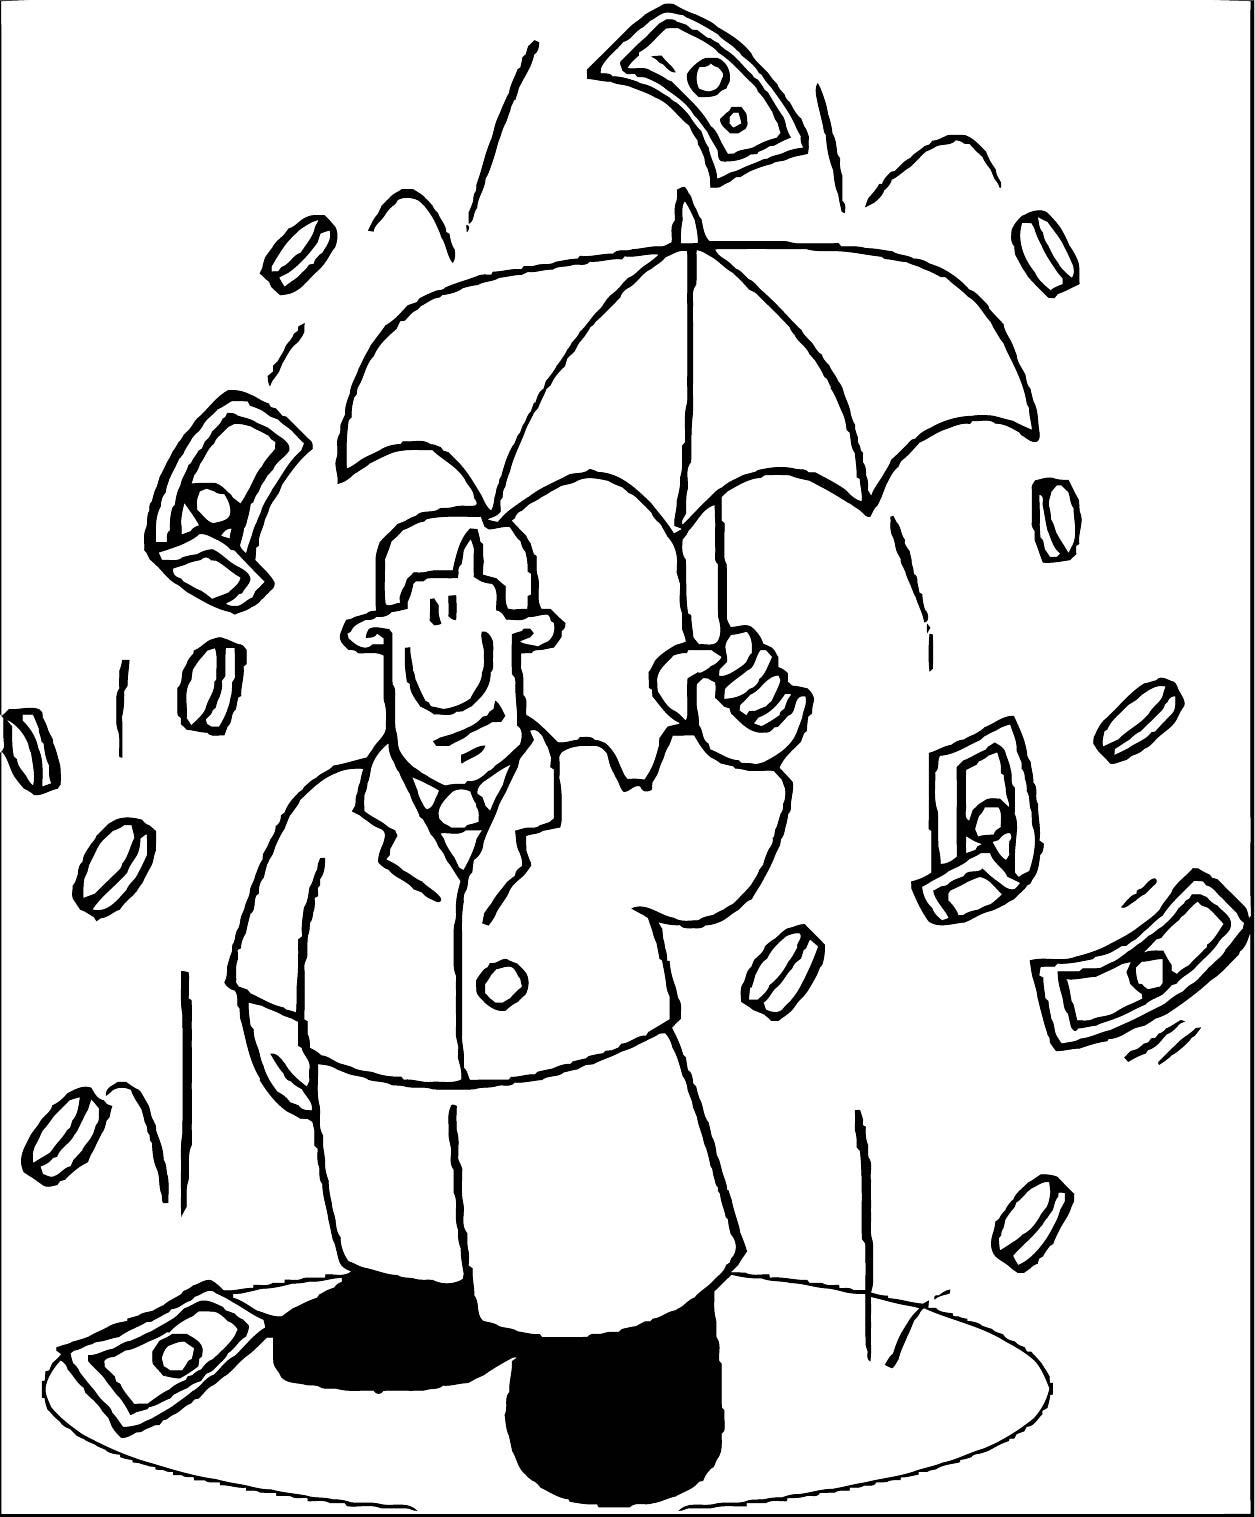 Raining Money 1 Coloring Page